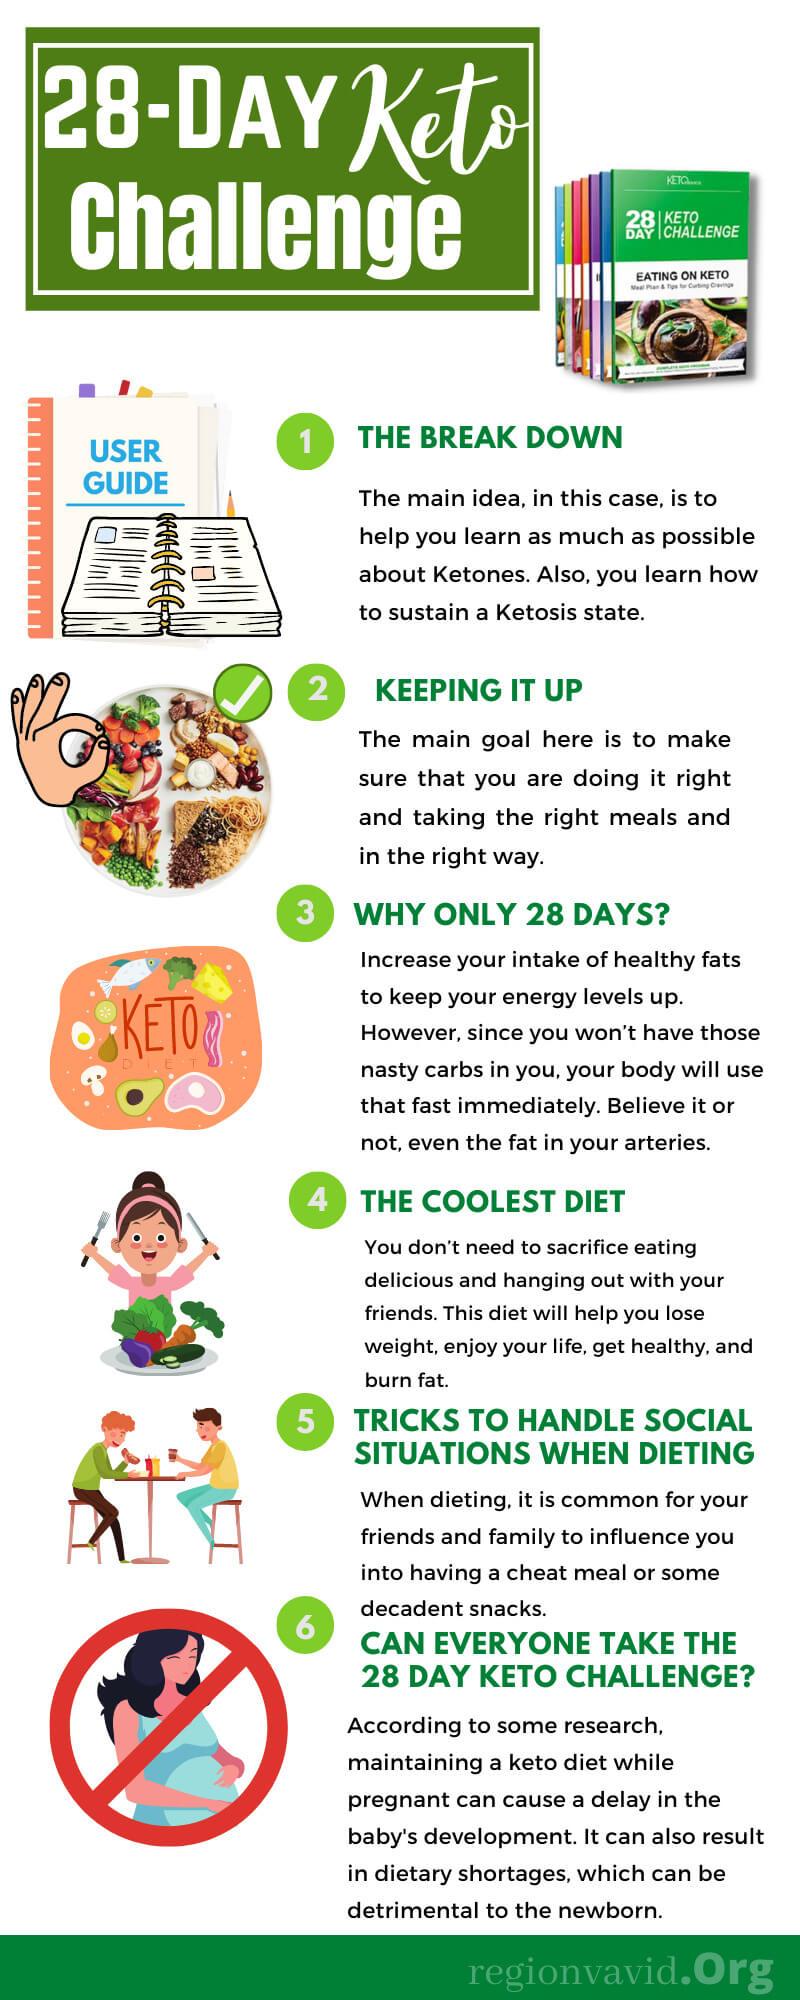 28-Day Keto Challenge Benefits